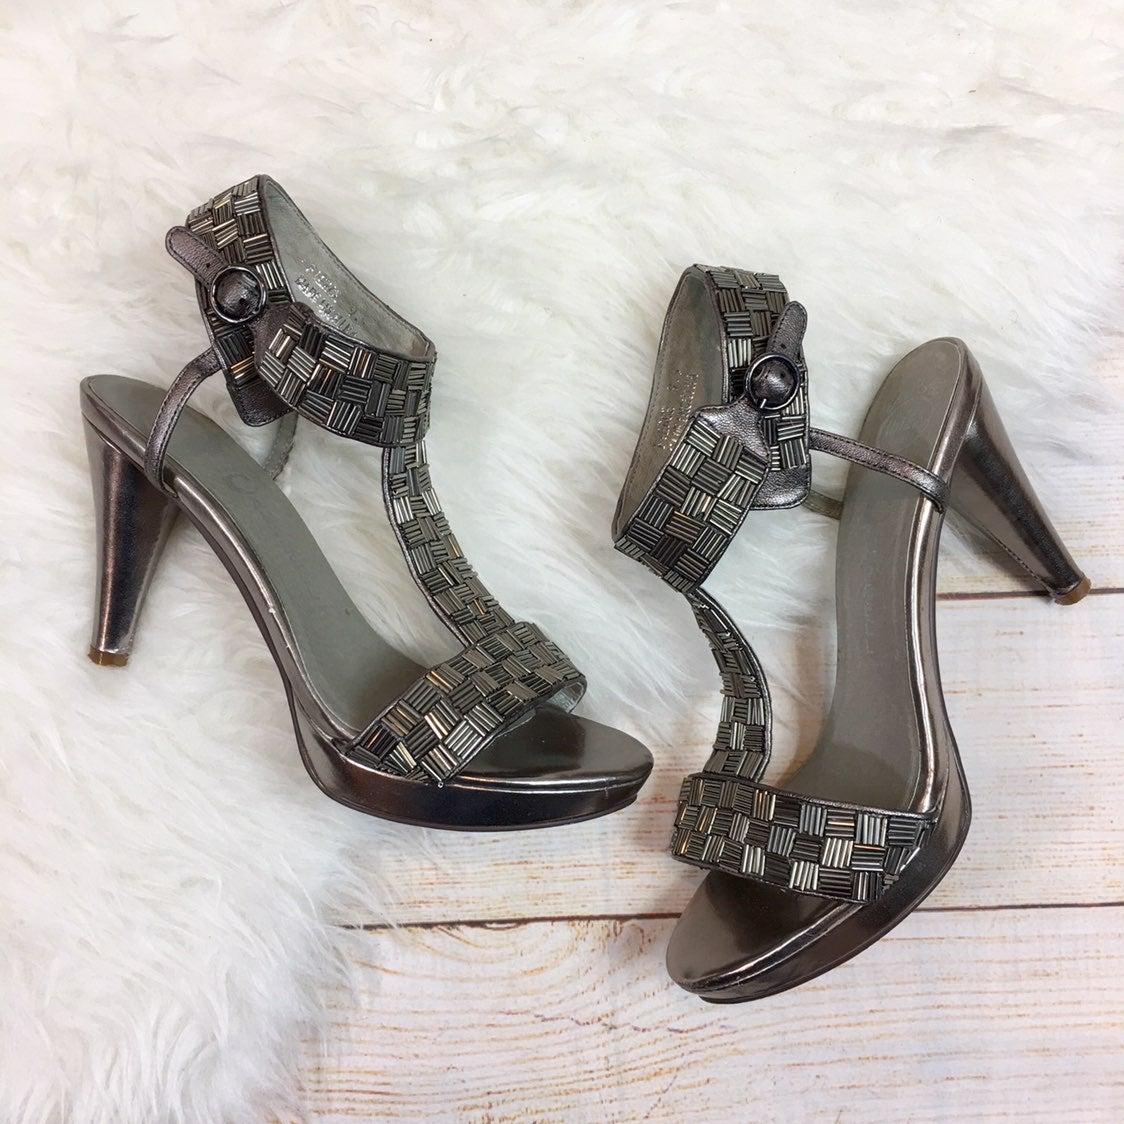 Jeffrey Campbell Beaded Dressy Heels 9.5